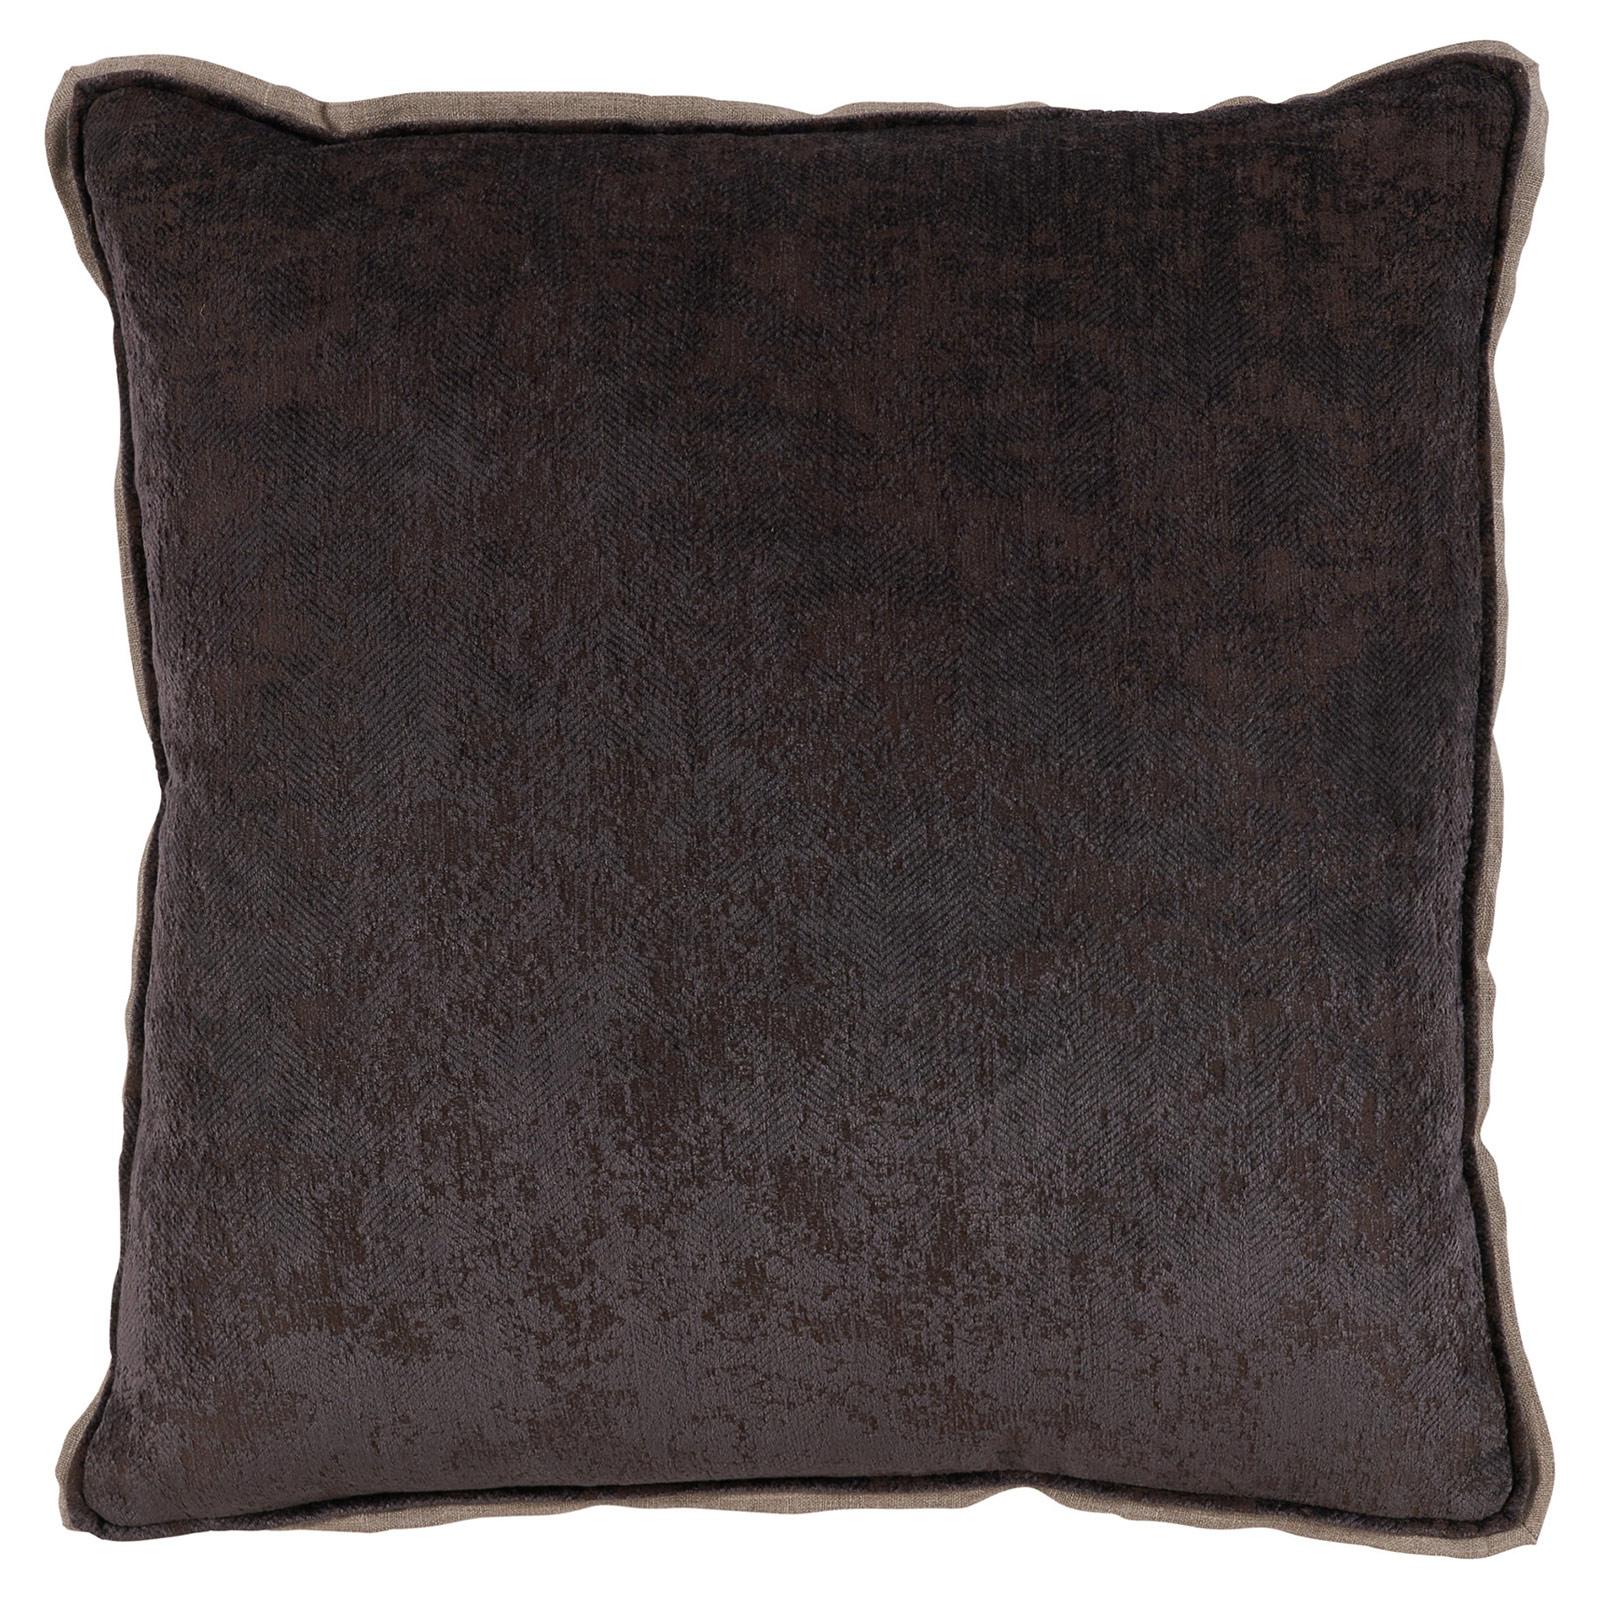 Harriet Regency Washed Herringbone Rust Red Pillow - 22x22